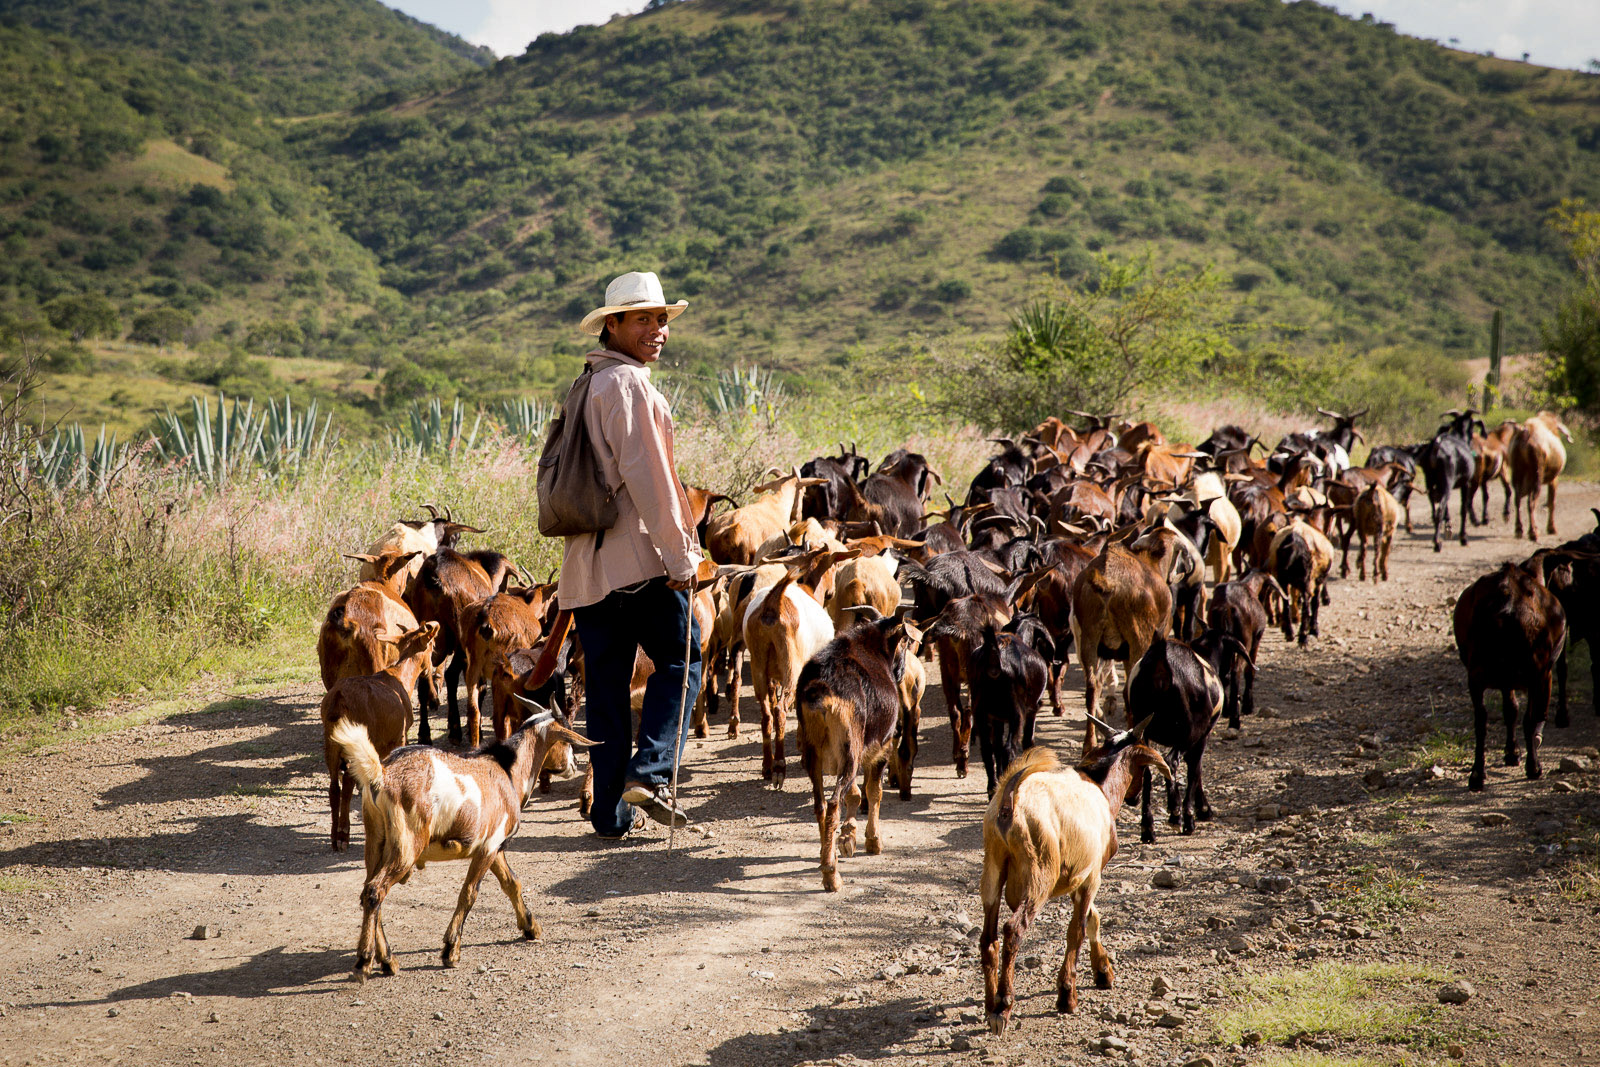 Goat Herder, San Baltazar, Oaxaca, Mexico